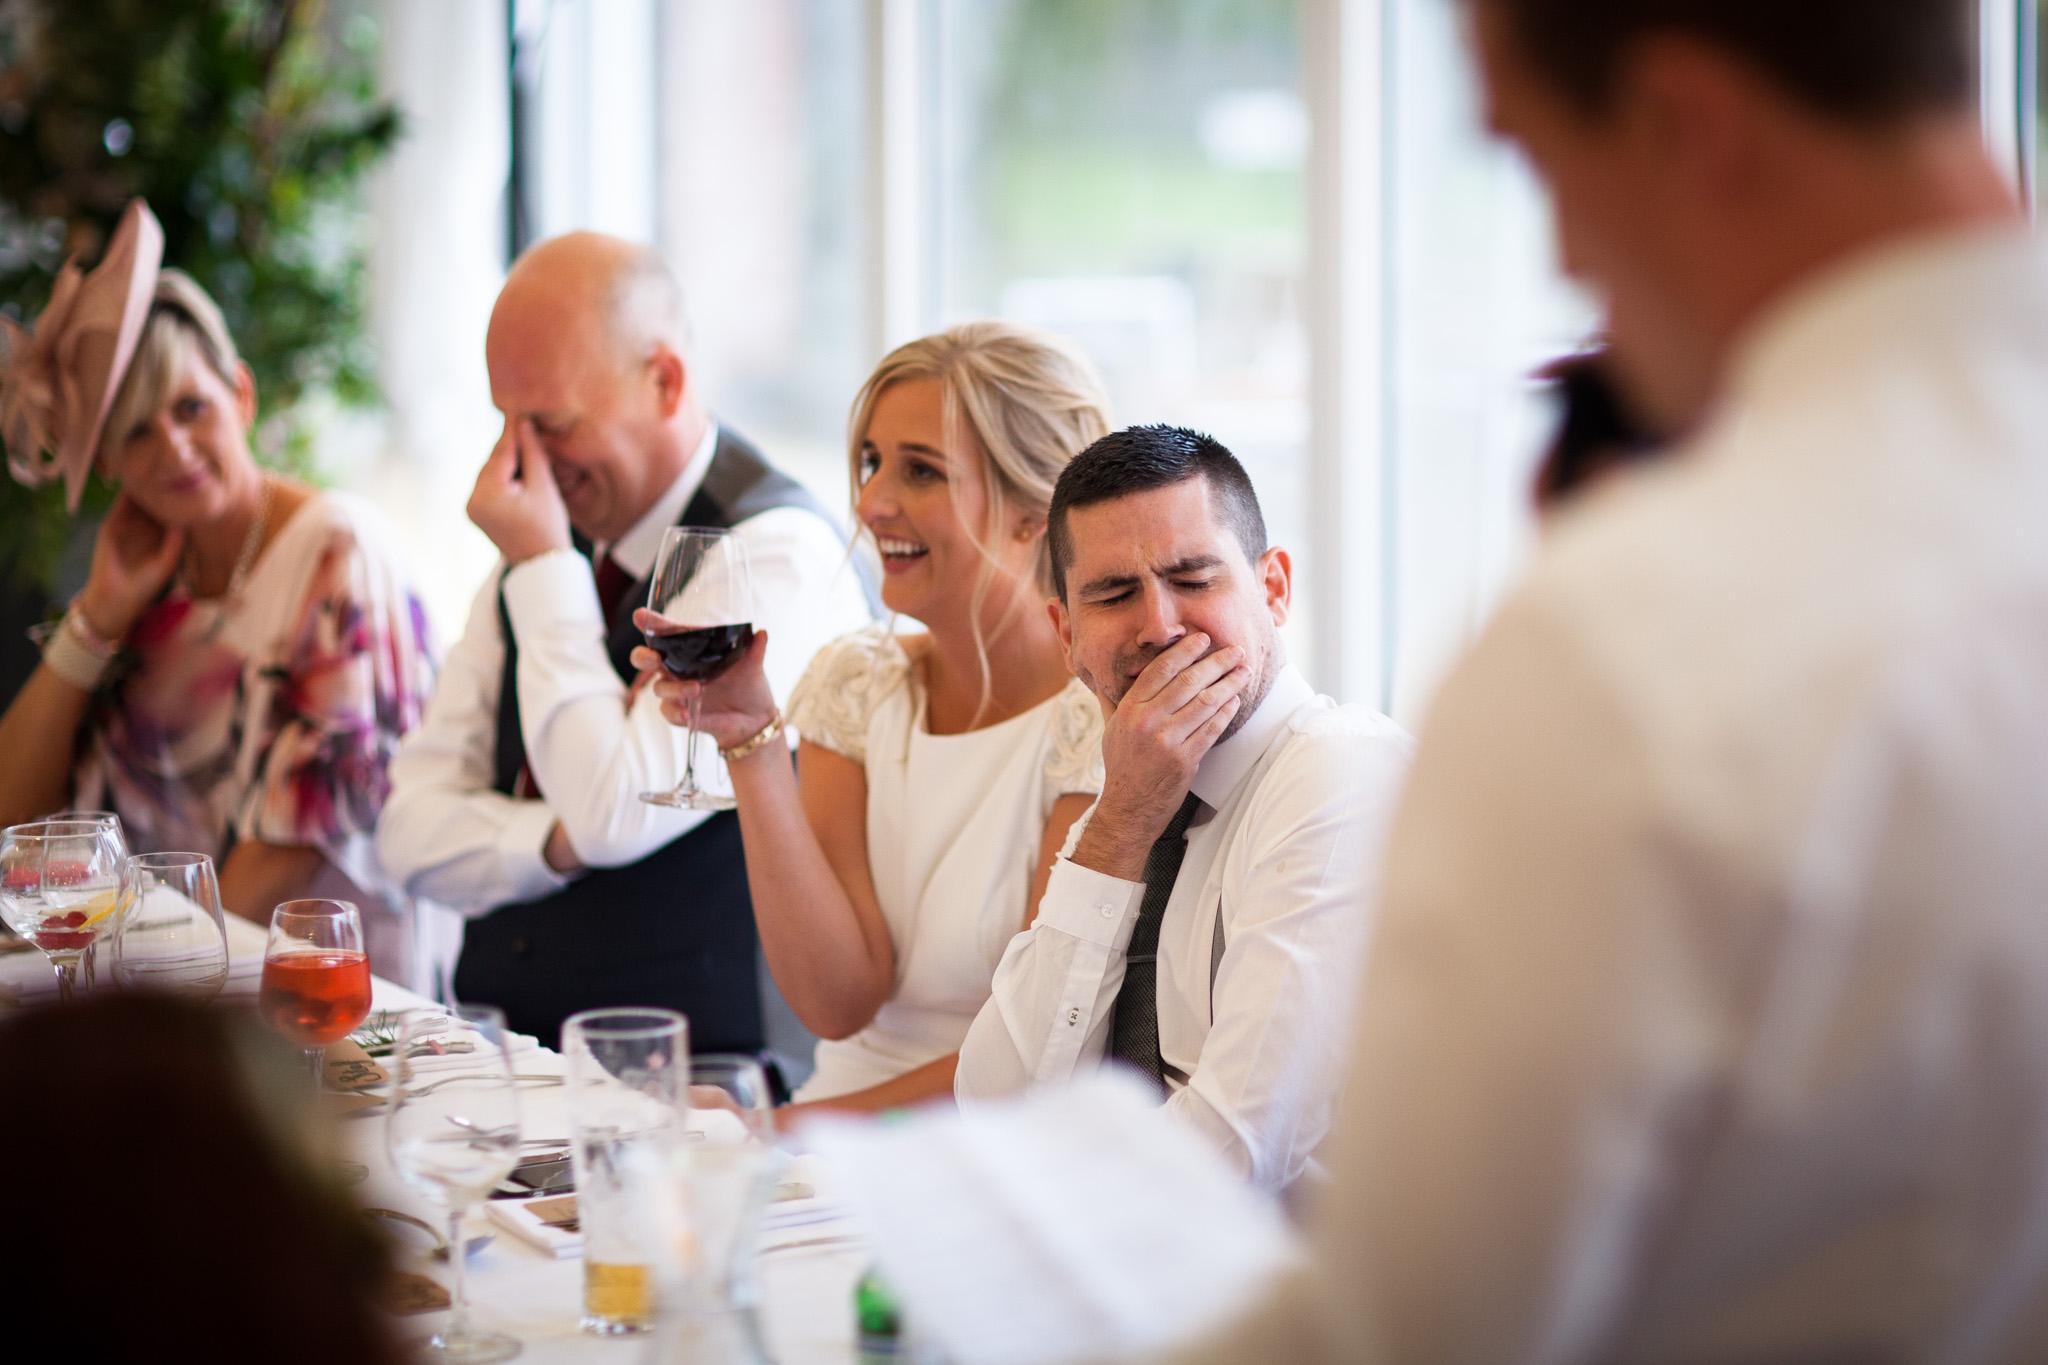 Mark_Barnes_Northern_Ireland_Wedding_Photography_Ballyscullion_Park_Wedding_Photography_Stef&Bobby-55.jpg